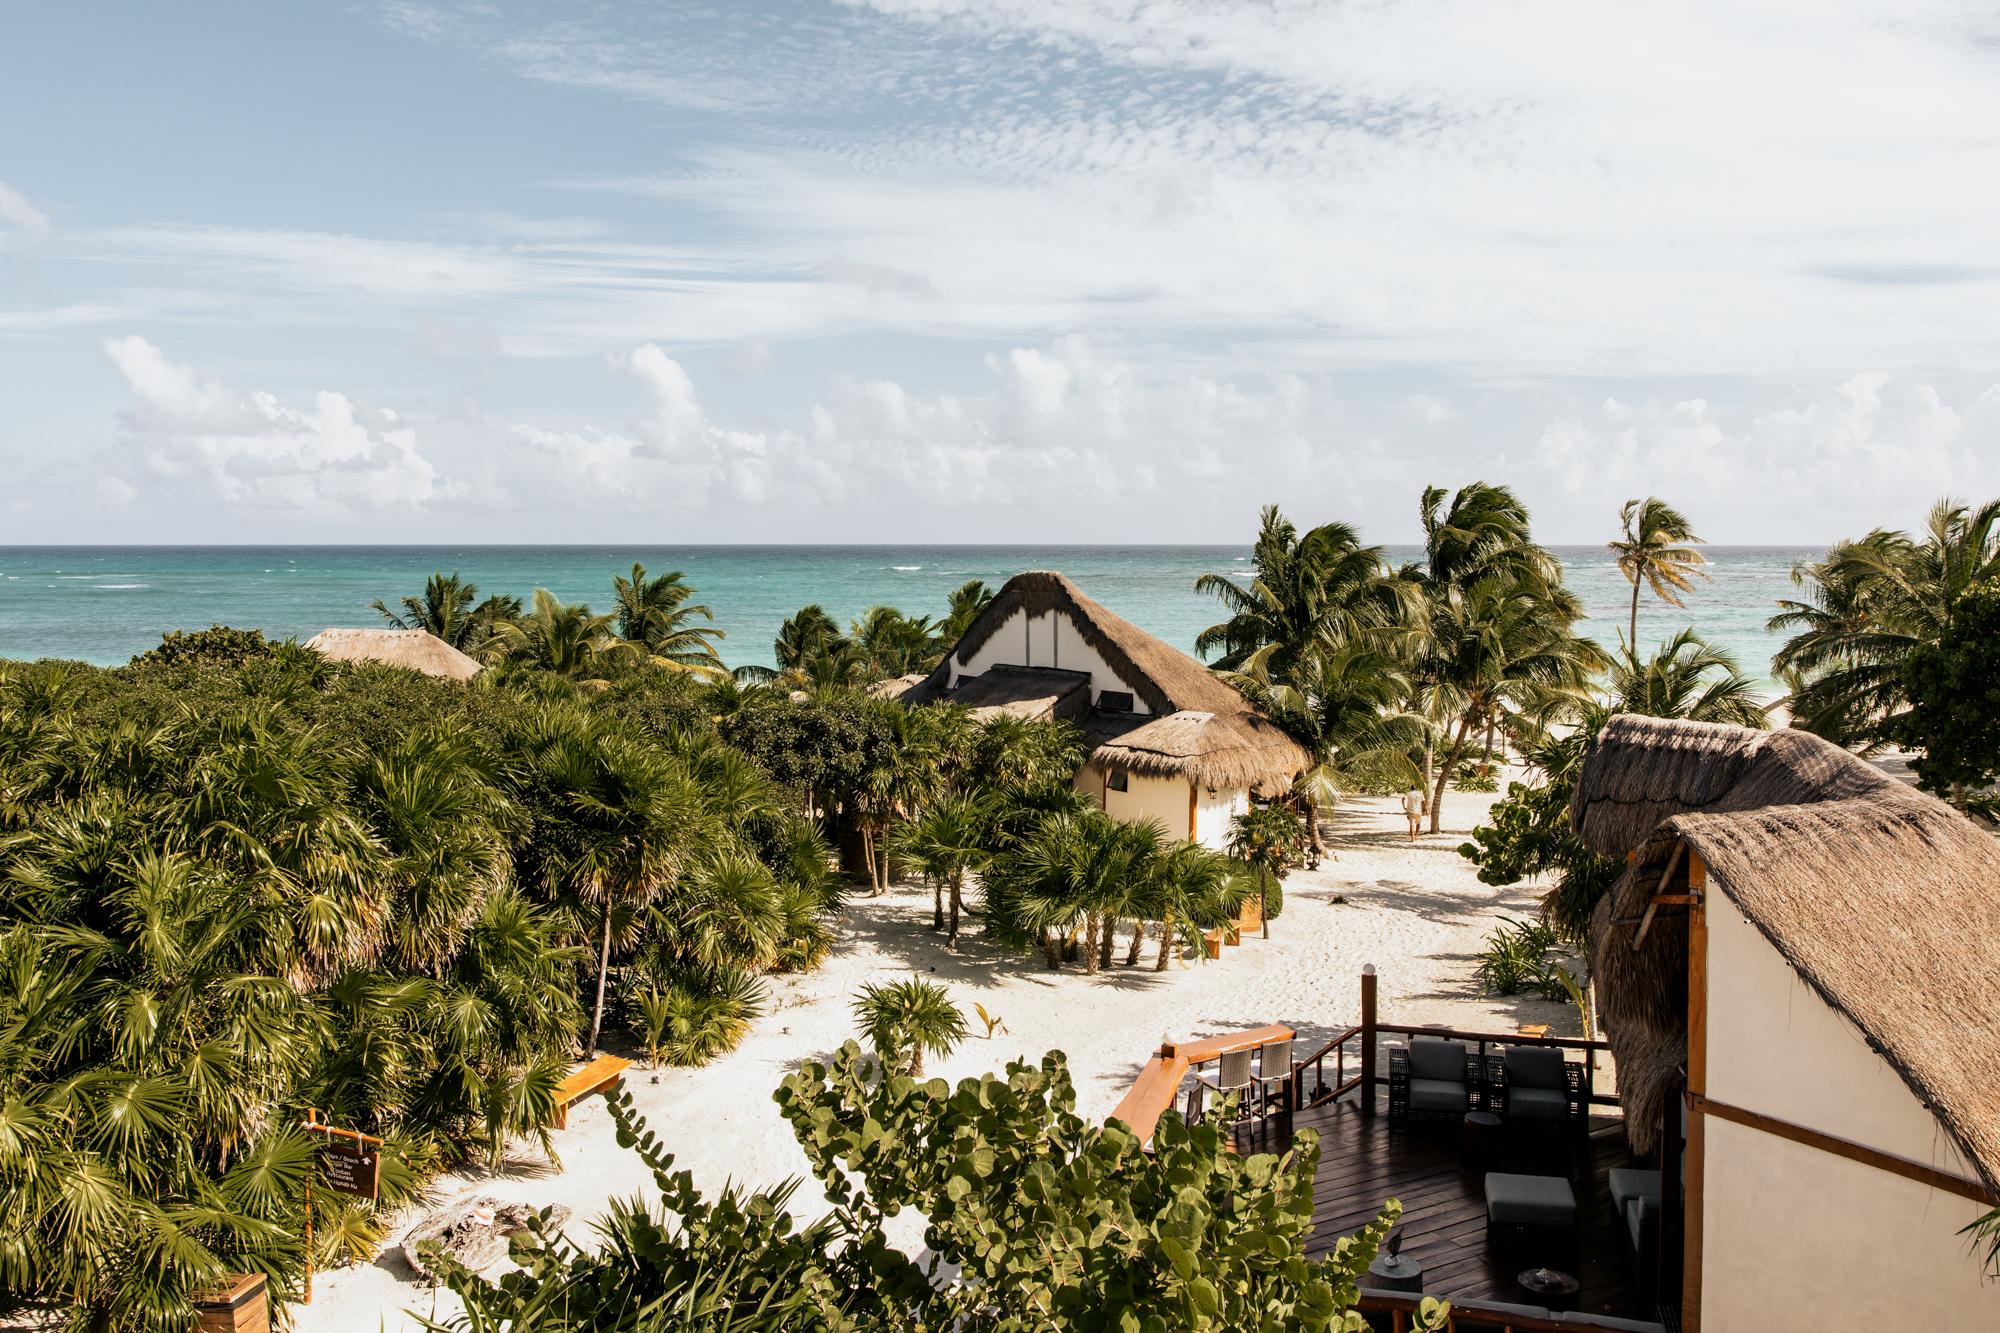 Mukan resort location